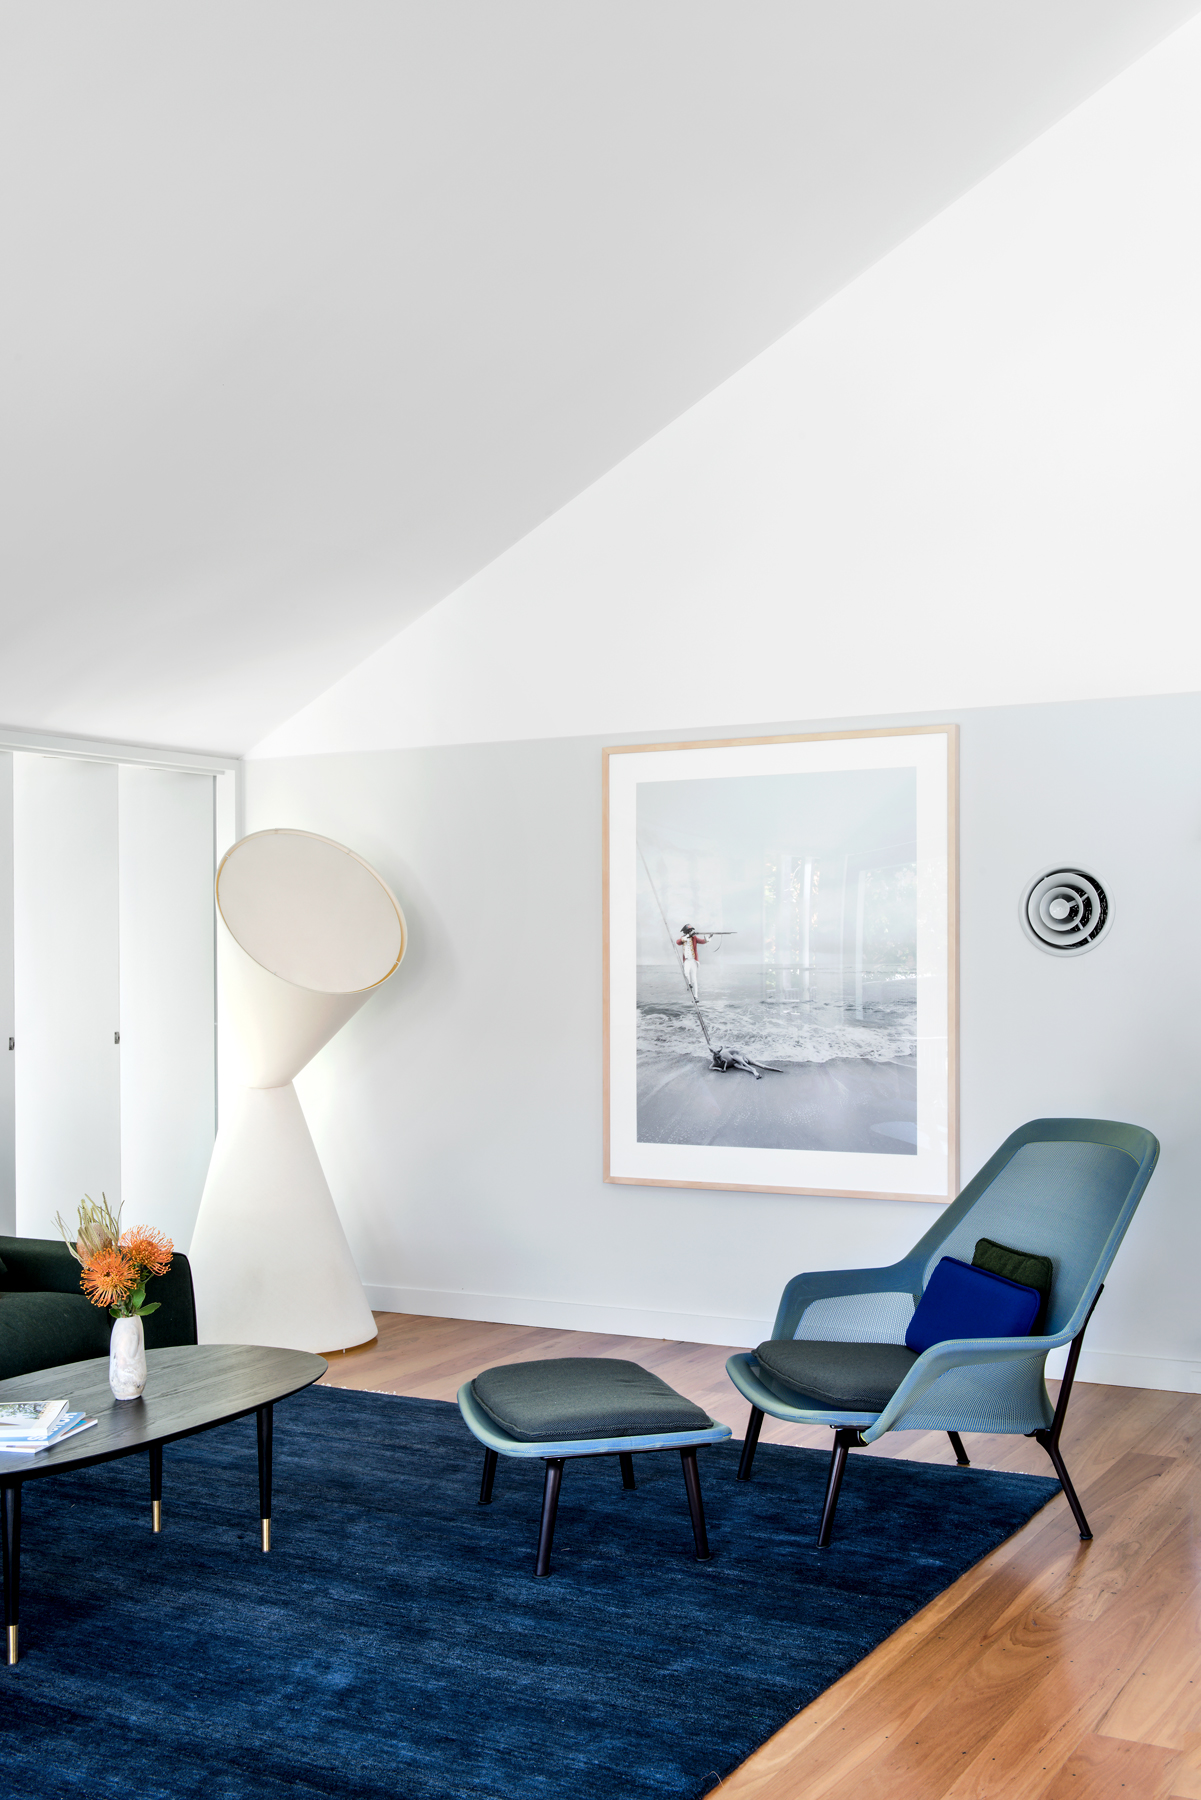 georgia-cannon-interior-designer-brisbane-rawson-house_05_S.jpg